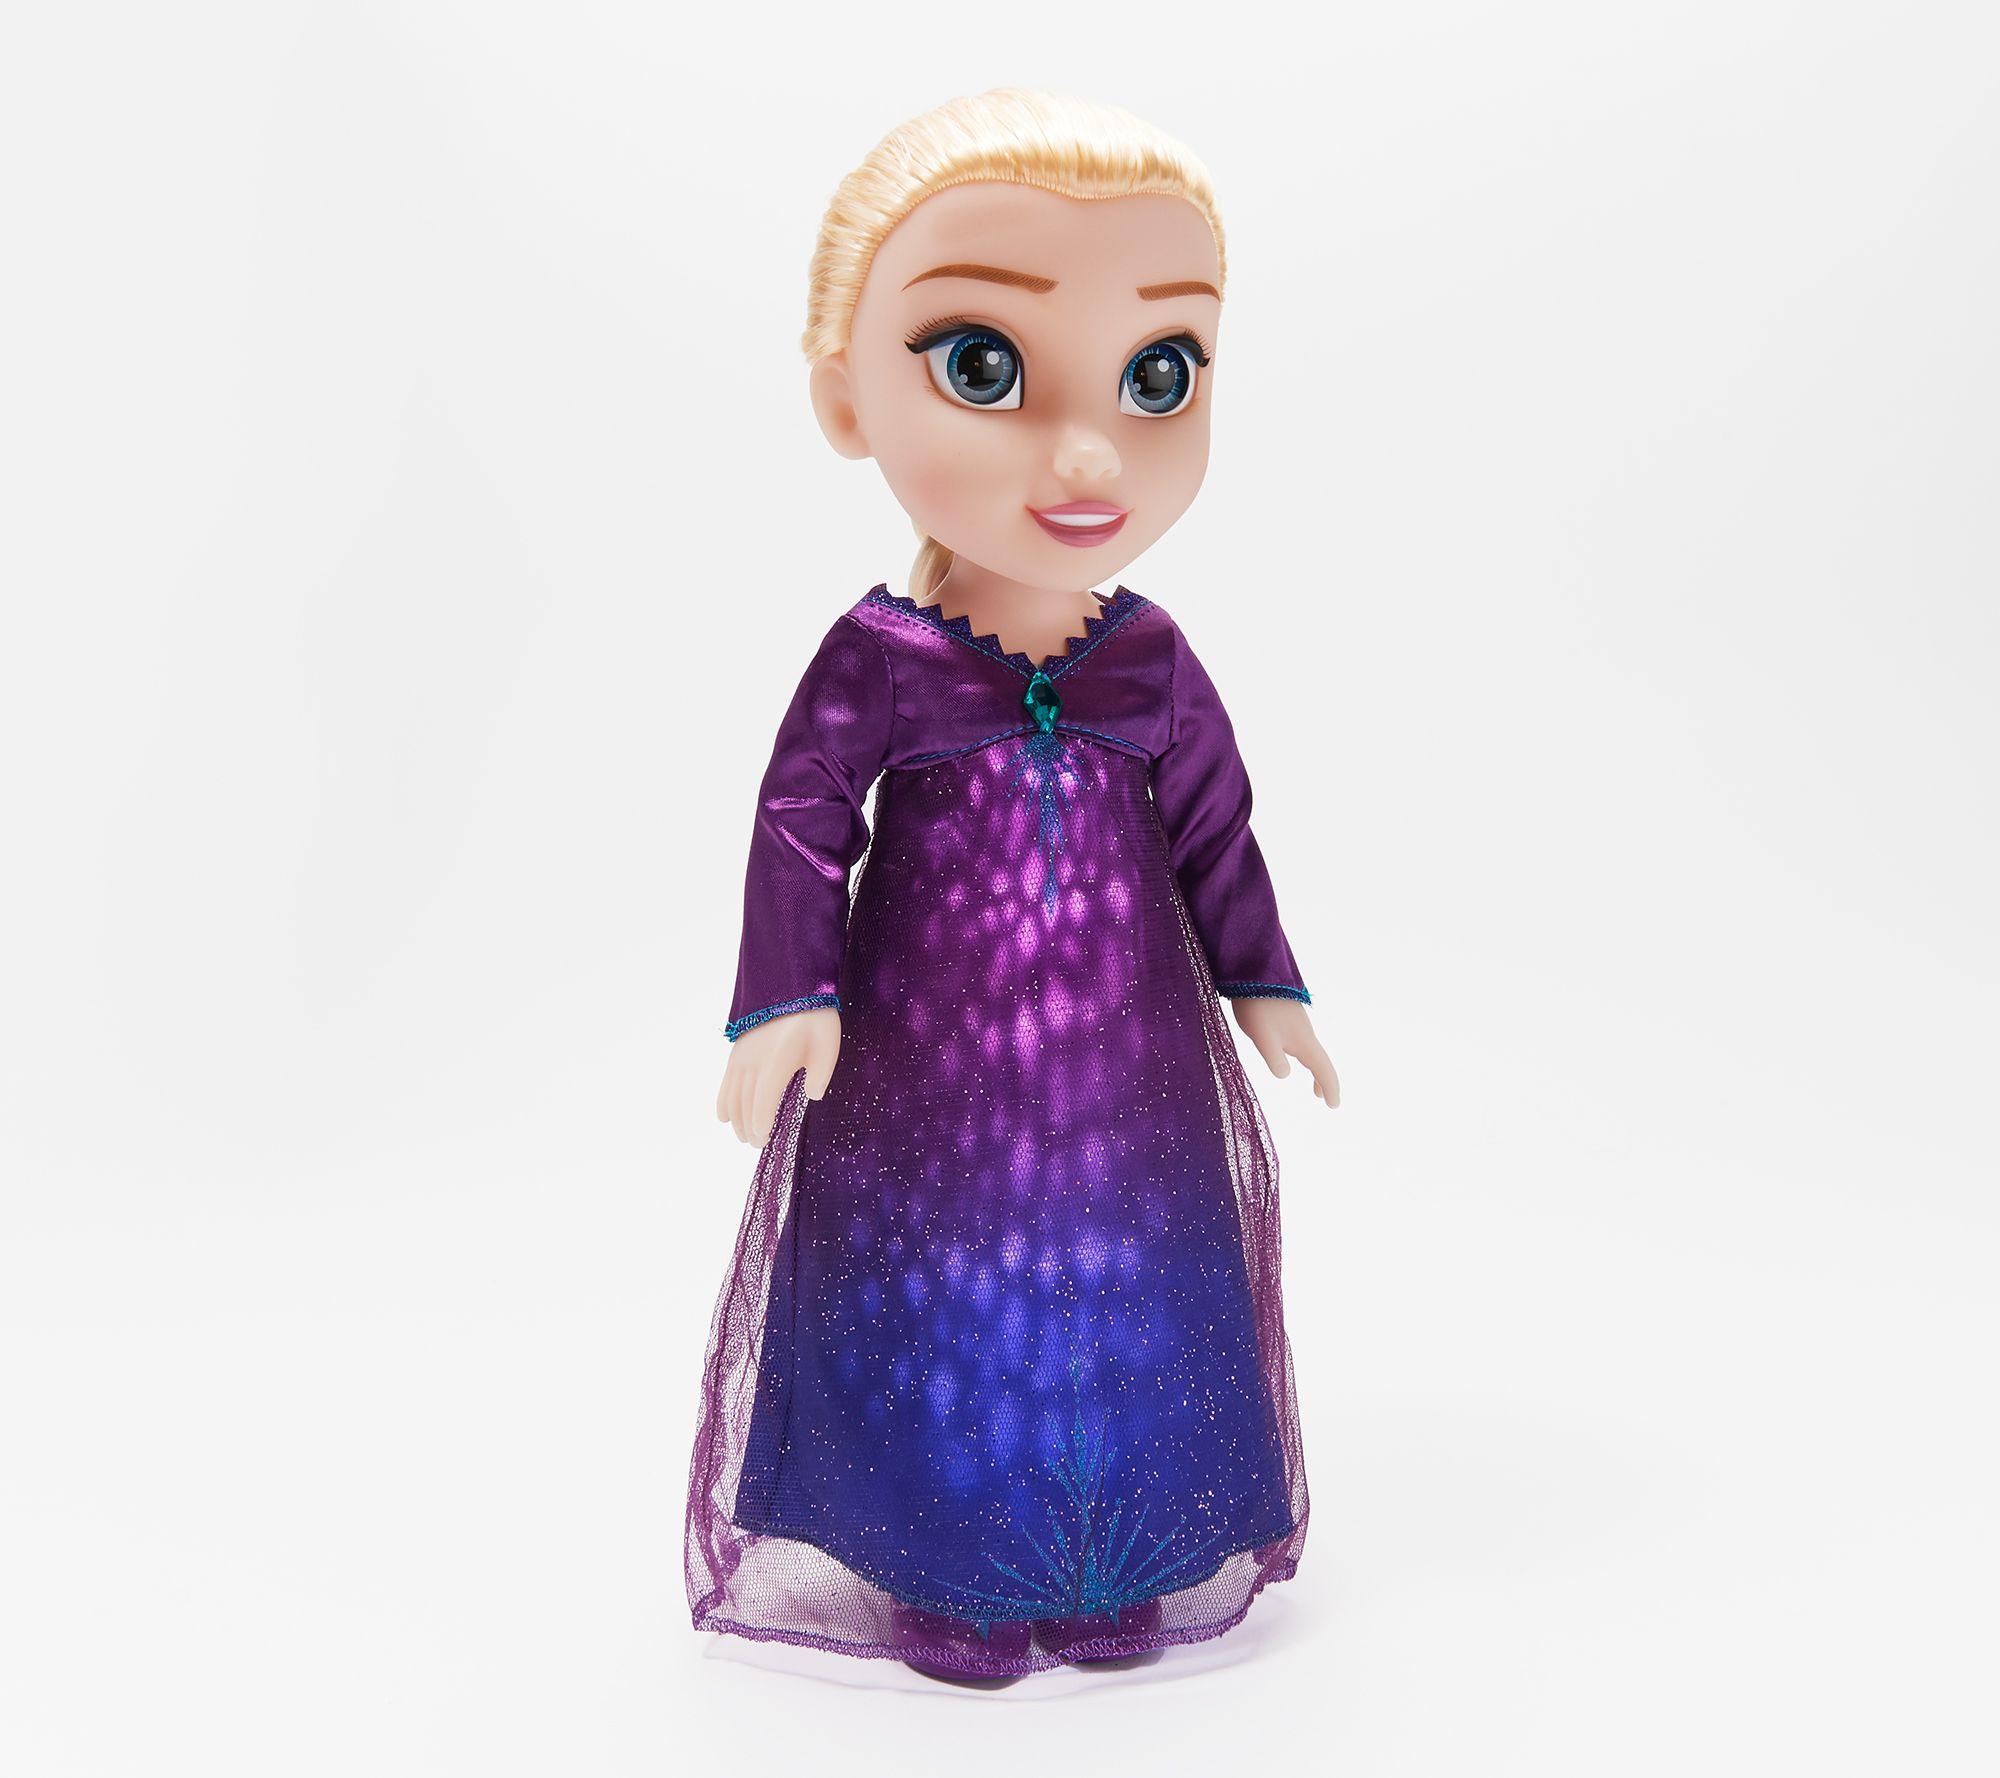 Disney S Frozen 2 Singing Elsa Doll With Light Up Dress